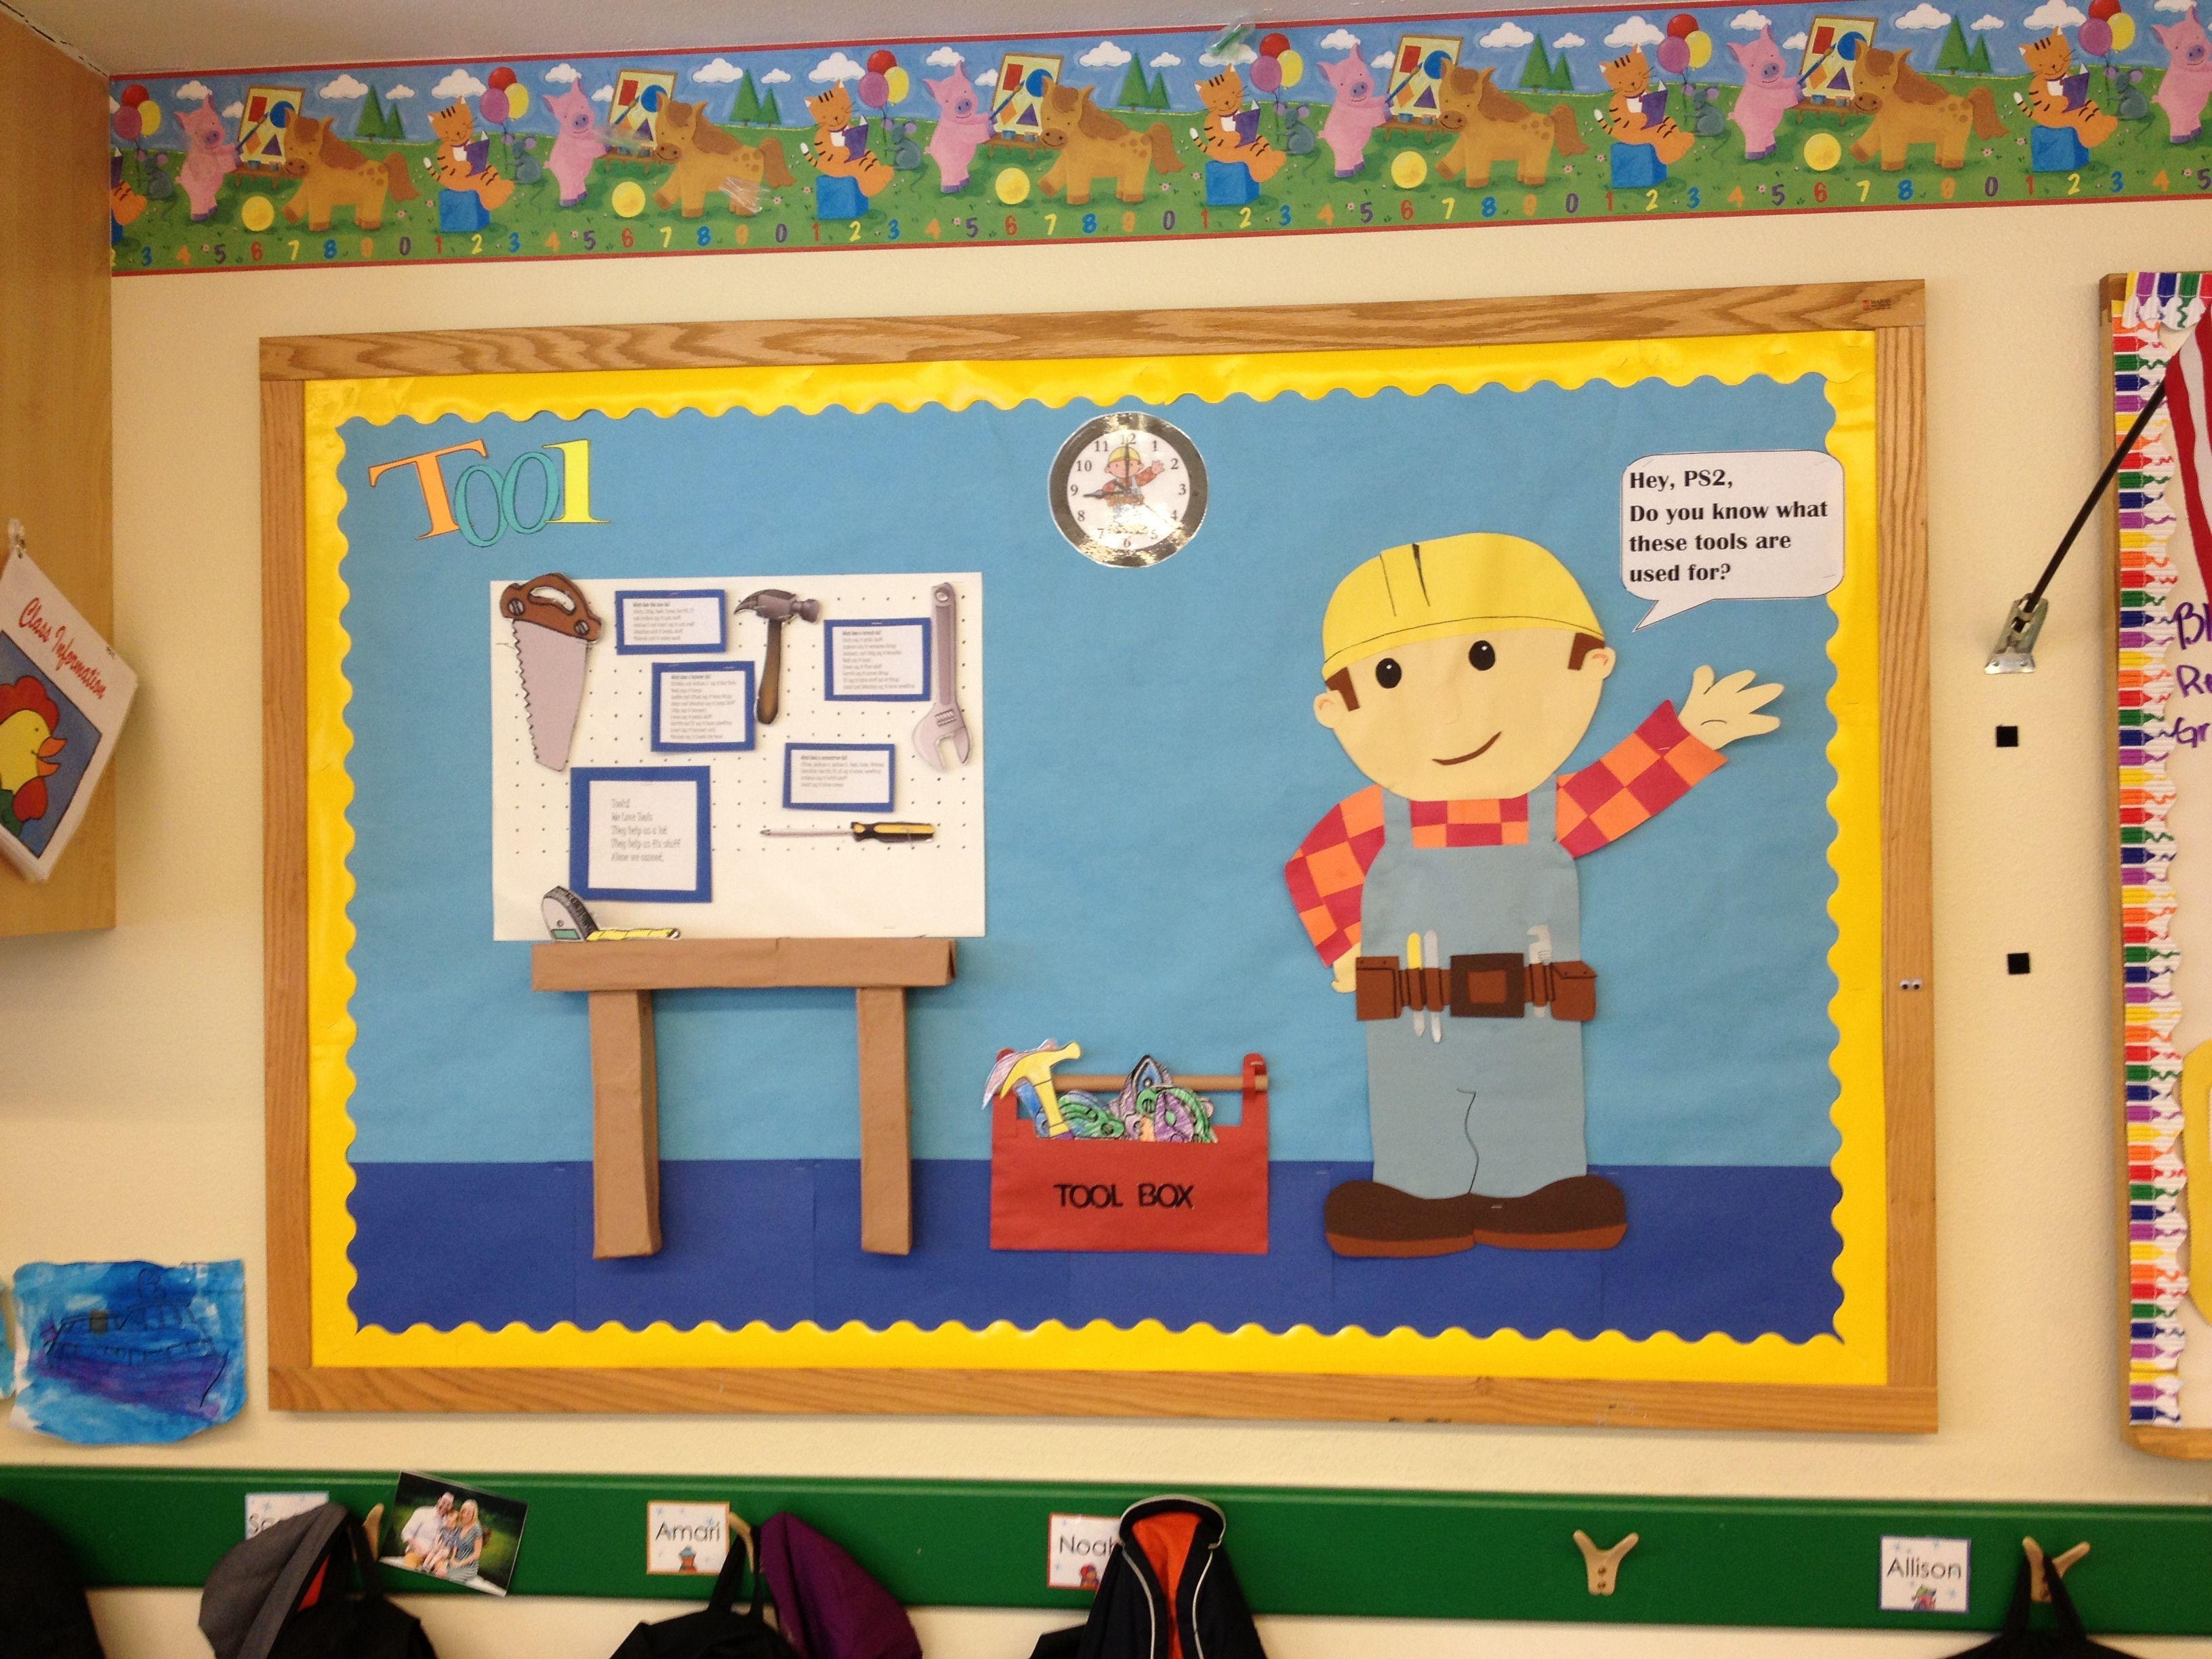 Bob The Builder Bulletin Board For Pre School Class On